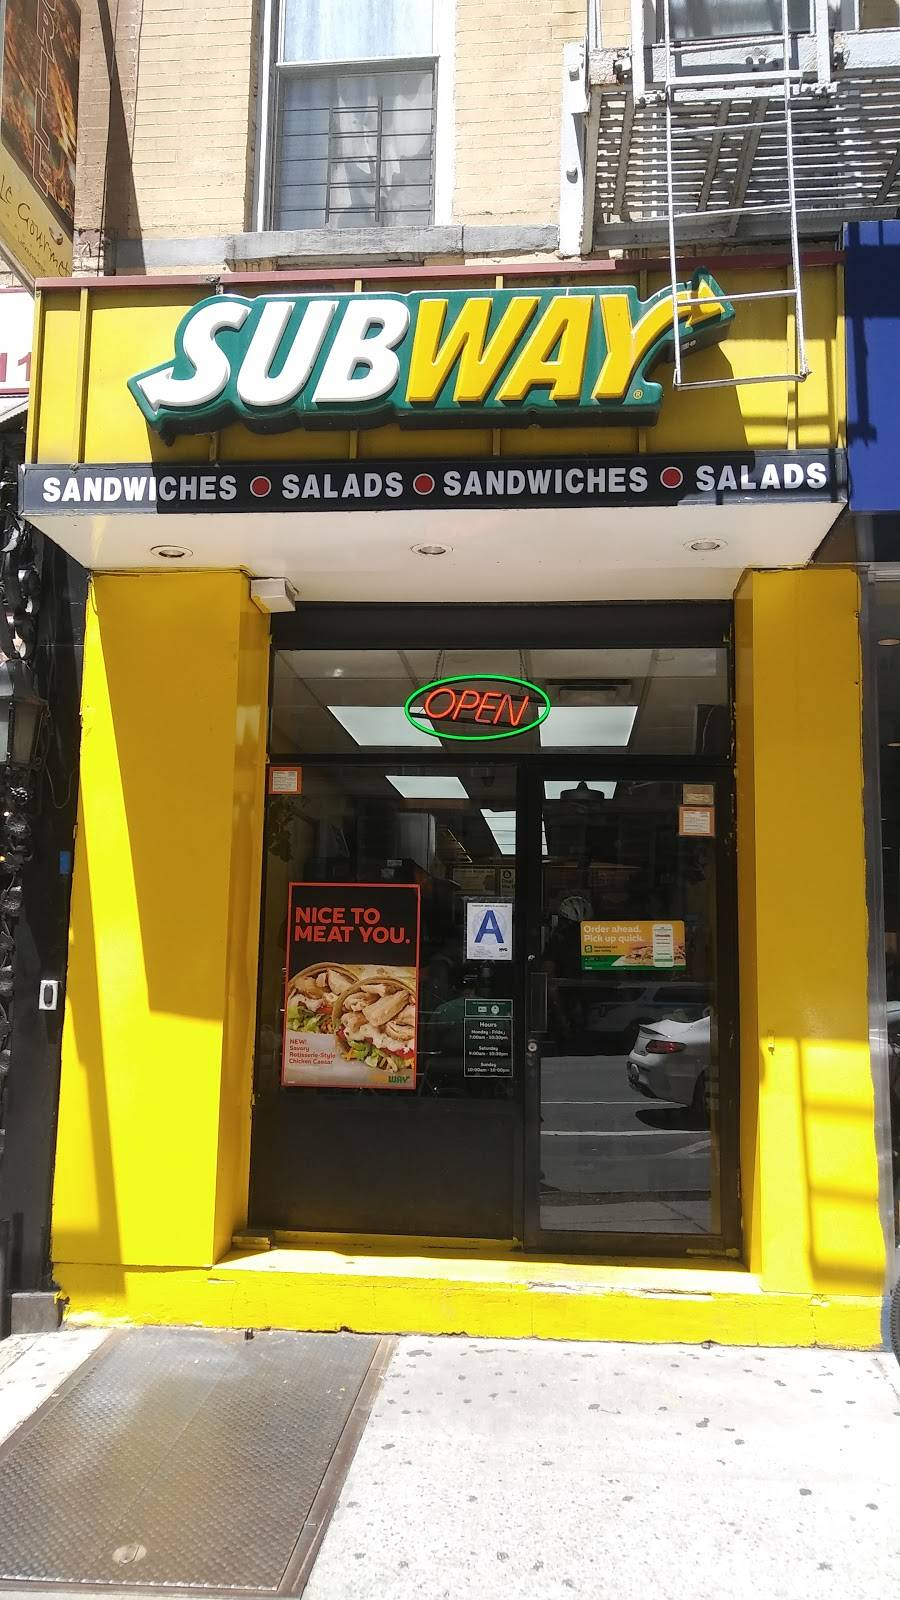 Subway Restaurants | restaurant | 1269-1271 1st Avenue, New York, NY 10065, USA | 2126286358 OR +1 212-628-6358